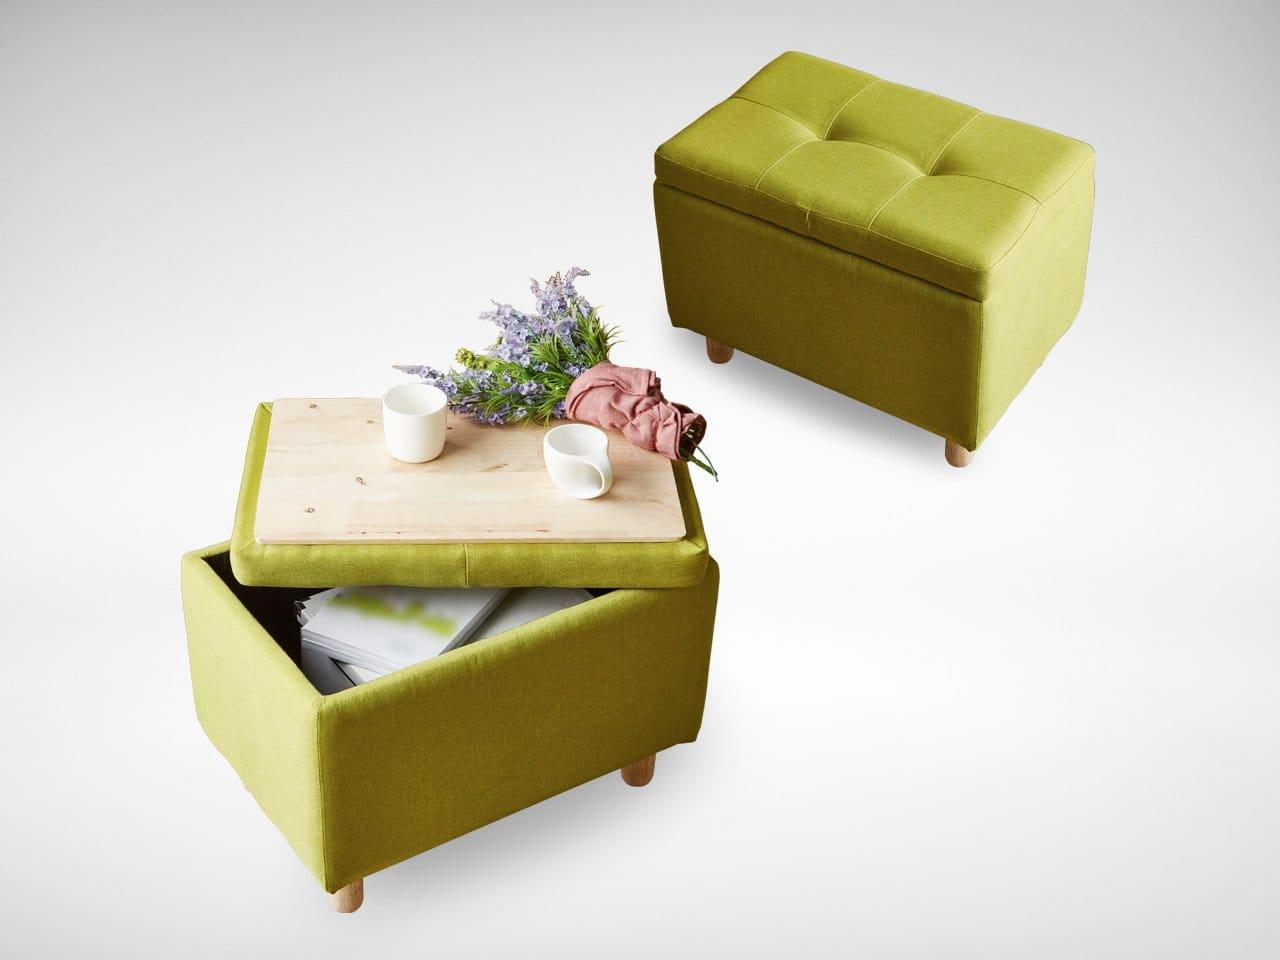 Trobe Stool Side Table Storage Comfort Design The  : Website Trobe Stool 2016 Feat from www.comfortfurniture.com.sg size 1280 x 960 jpeg 87kB